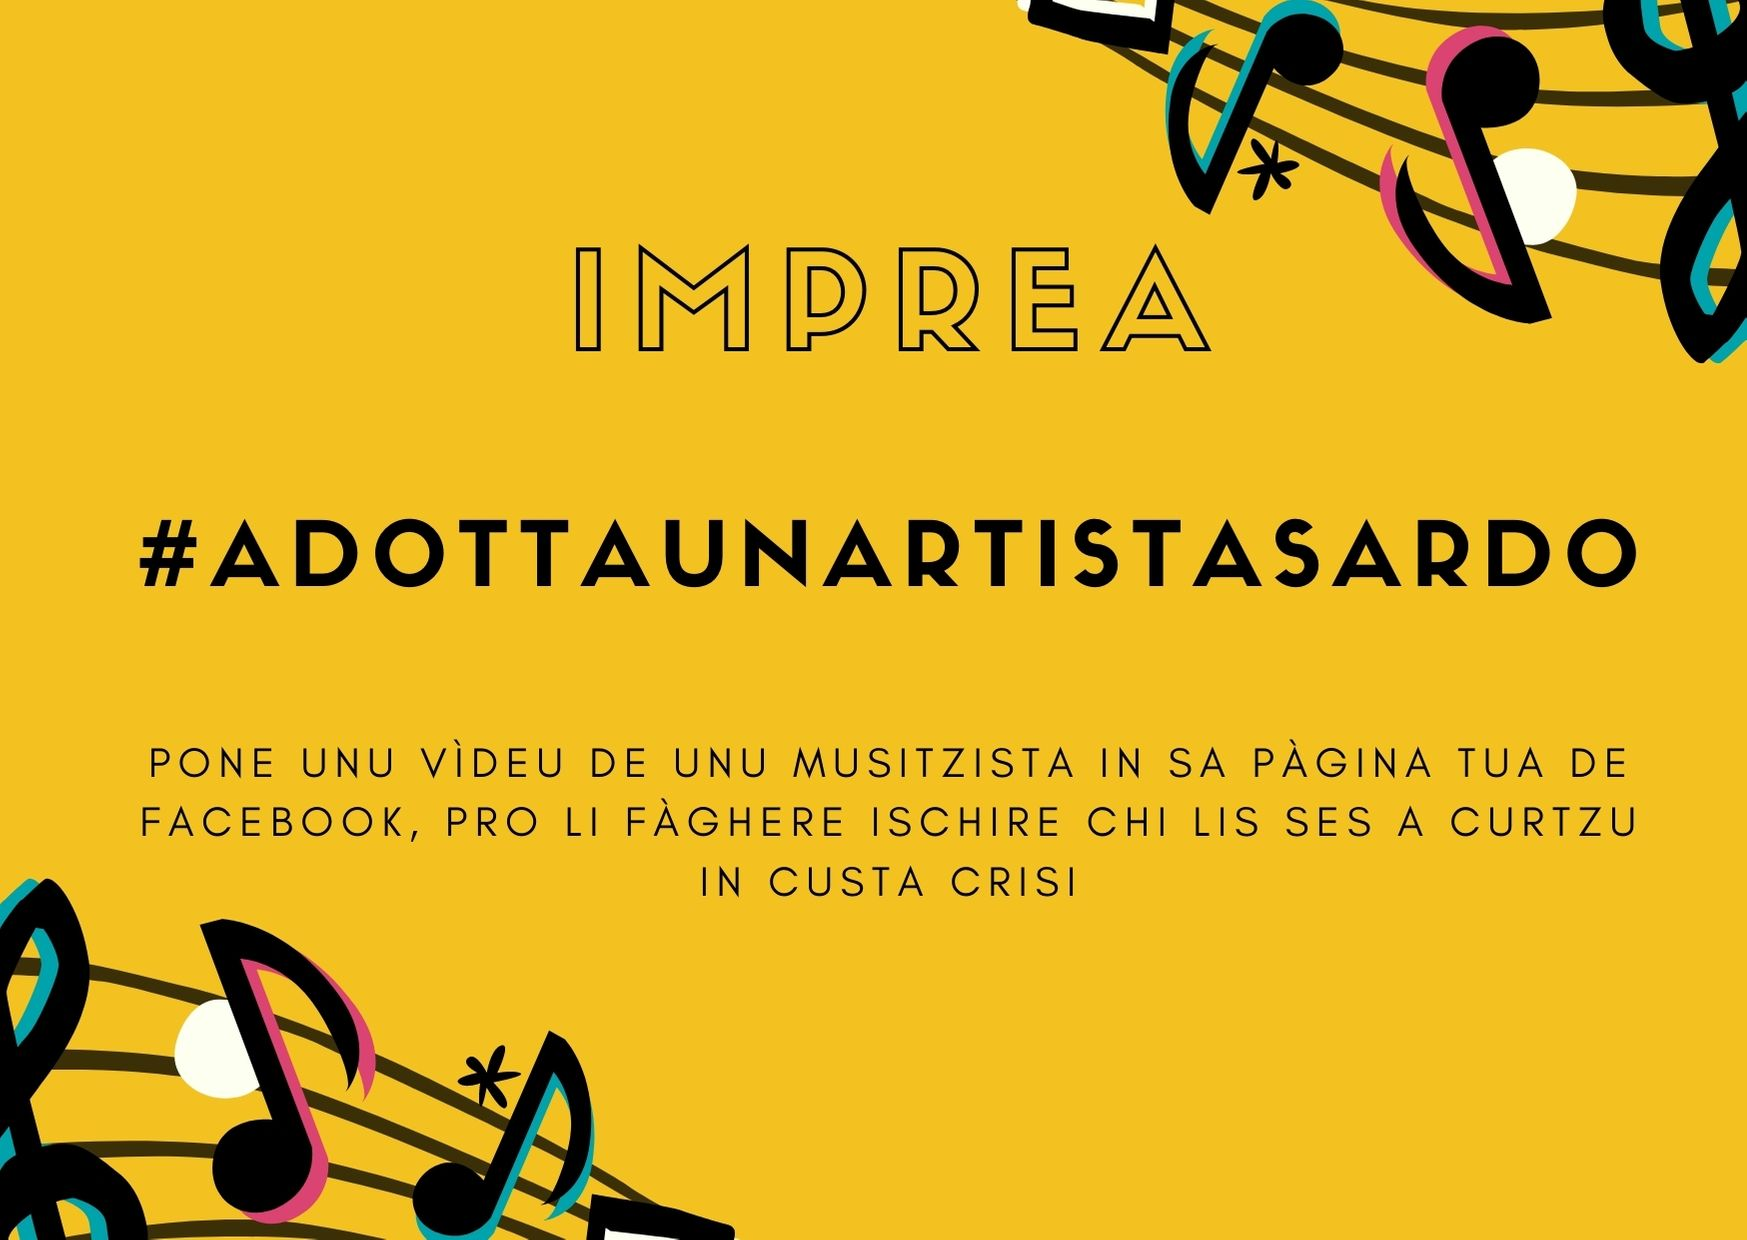 #adottaunartistasardo: pro amparare chie faghet arte in Sardigna